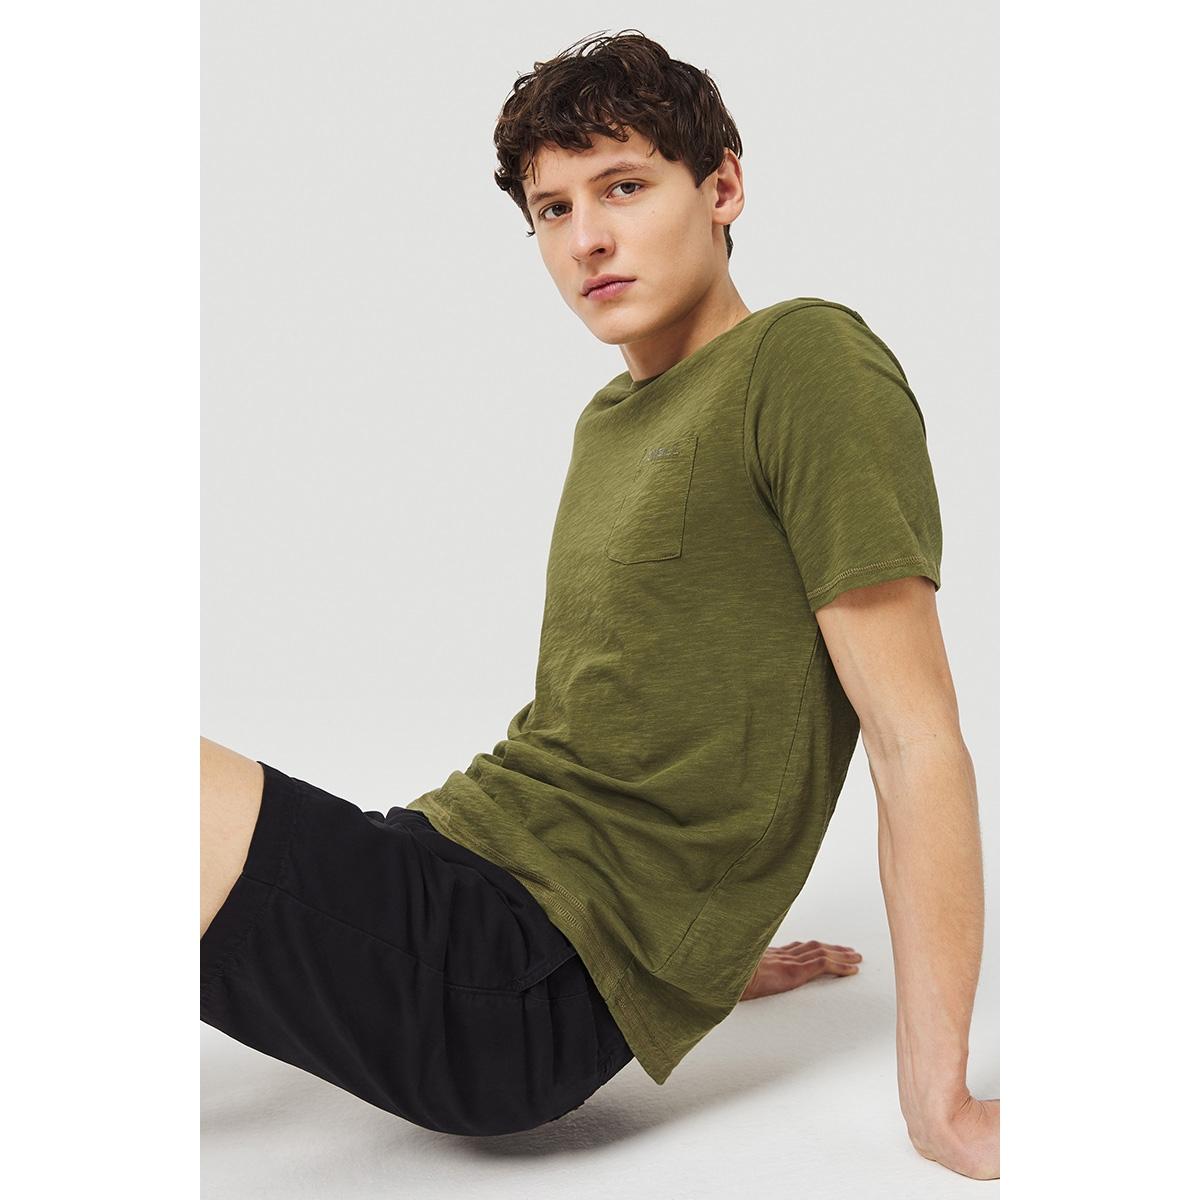 lm essentials t shirt 0a2334 o`neill t-shirt 6077 winter mos